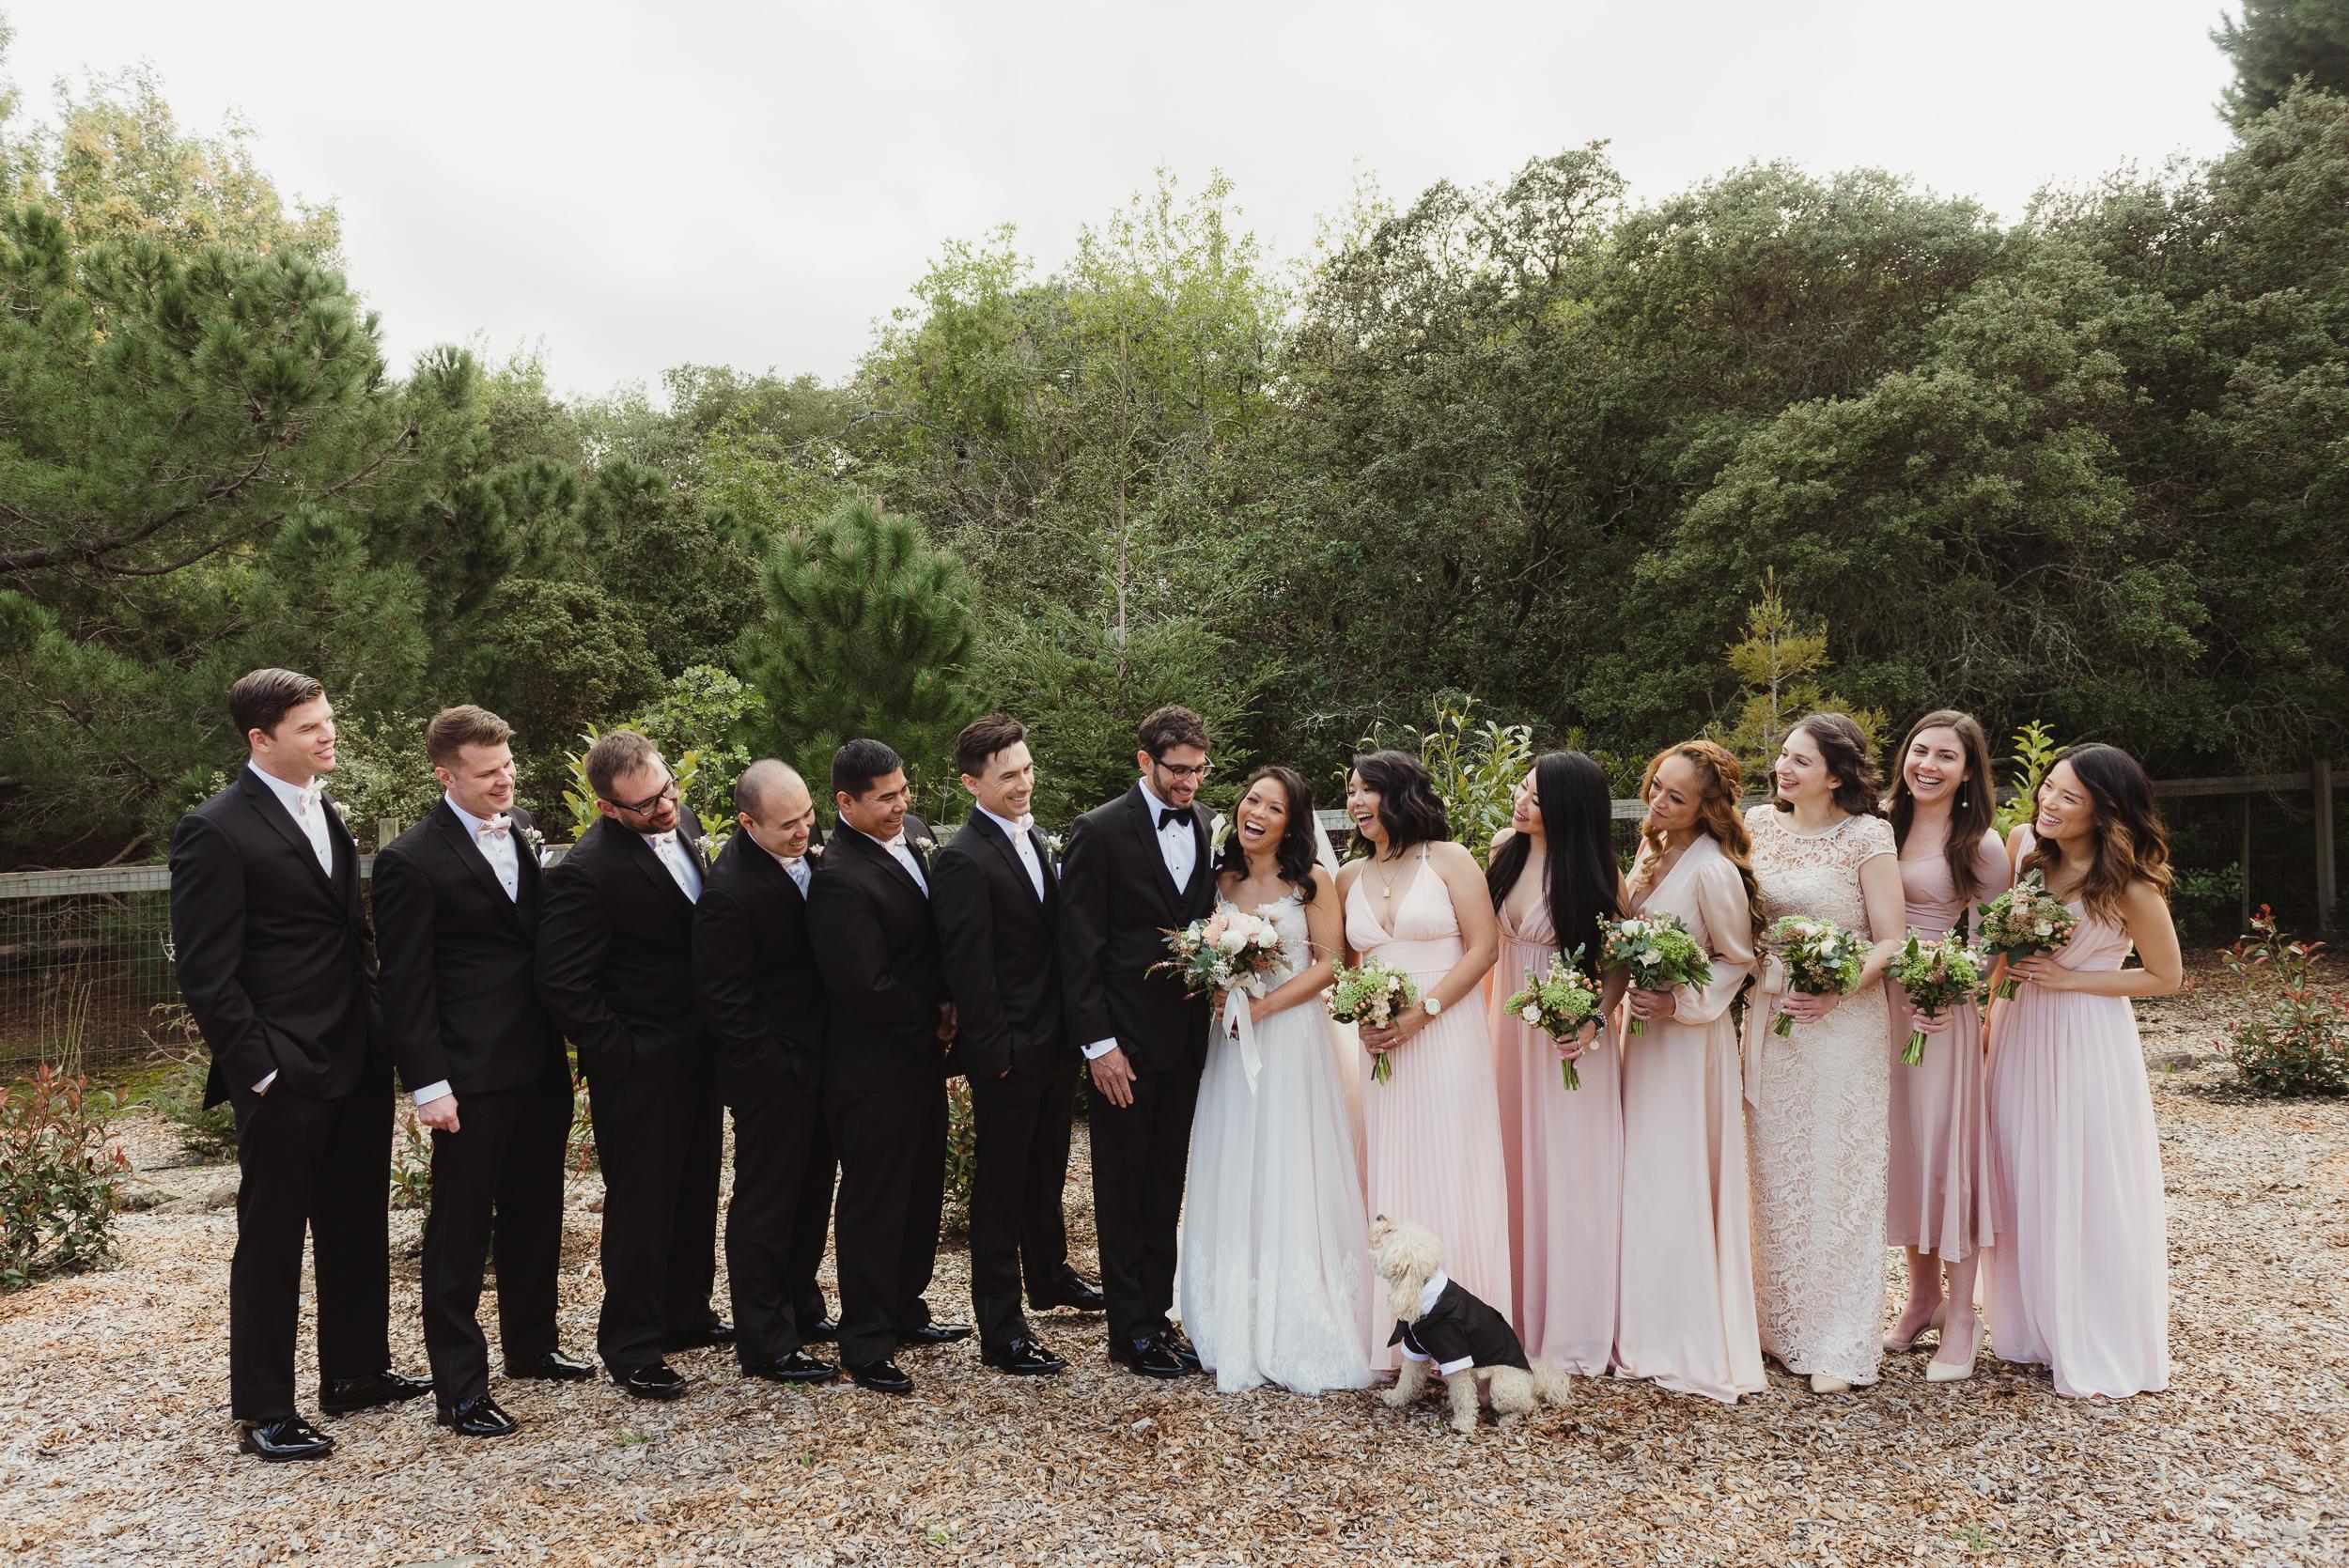 12-woodside-backyard-wedding-vivianchen-0154.jpg